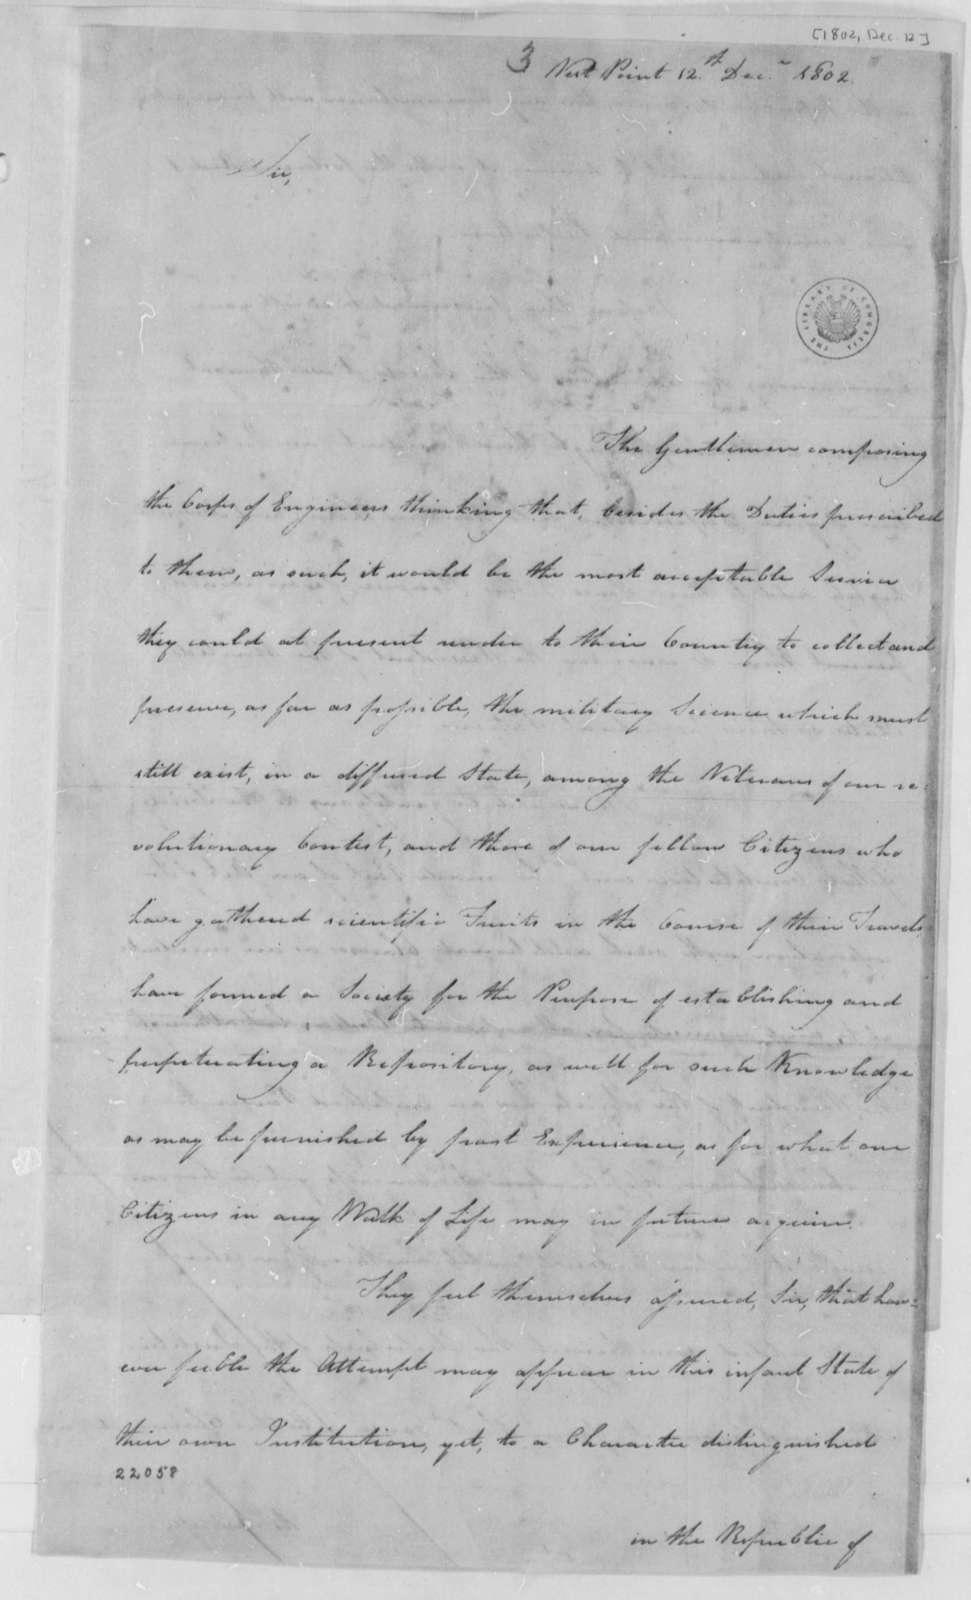 Jonathan Williams to Thomas Jefferson, December 12, 1802